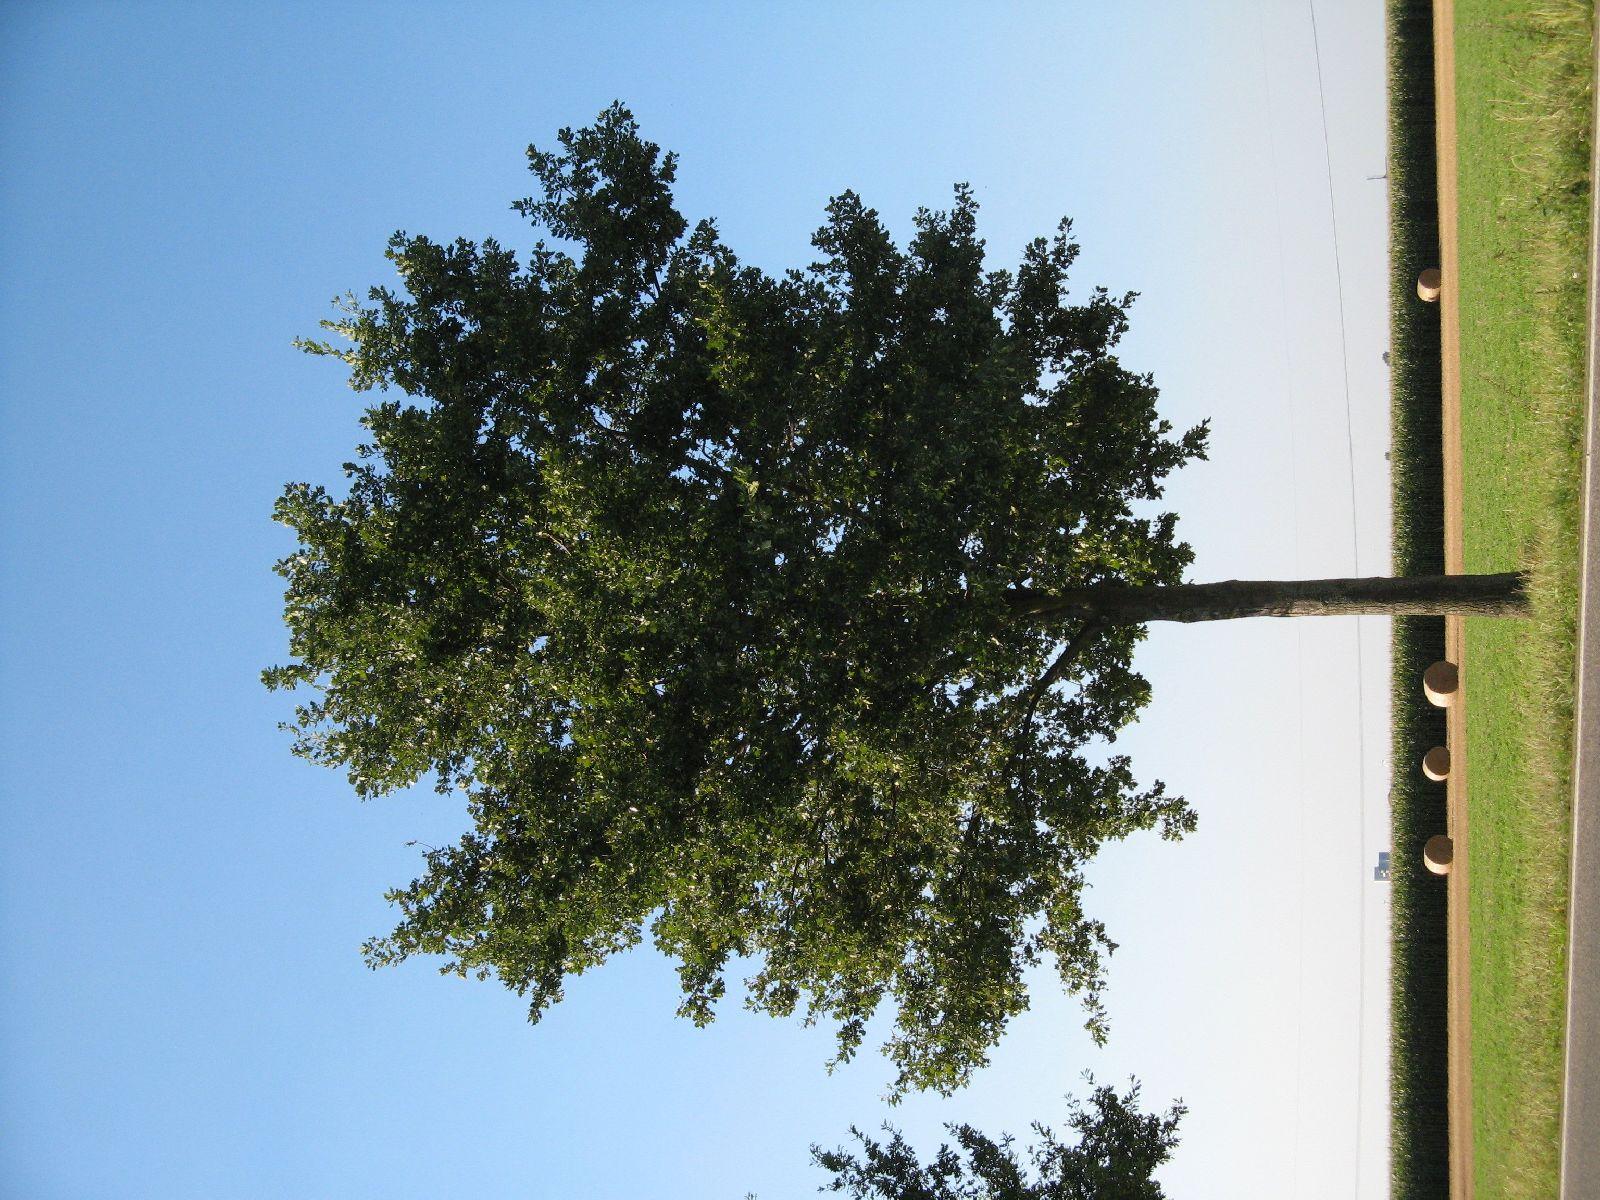 Plants-Trees_Photo_Texture_B_1249